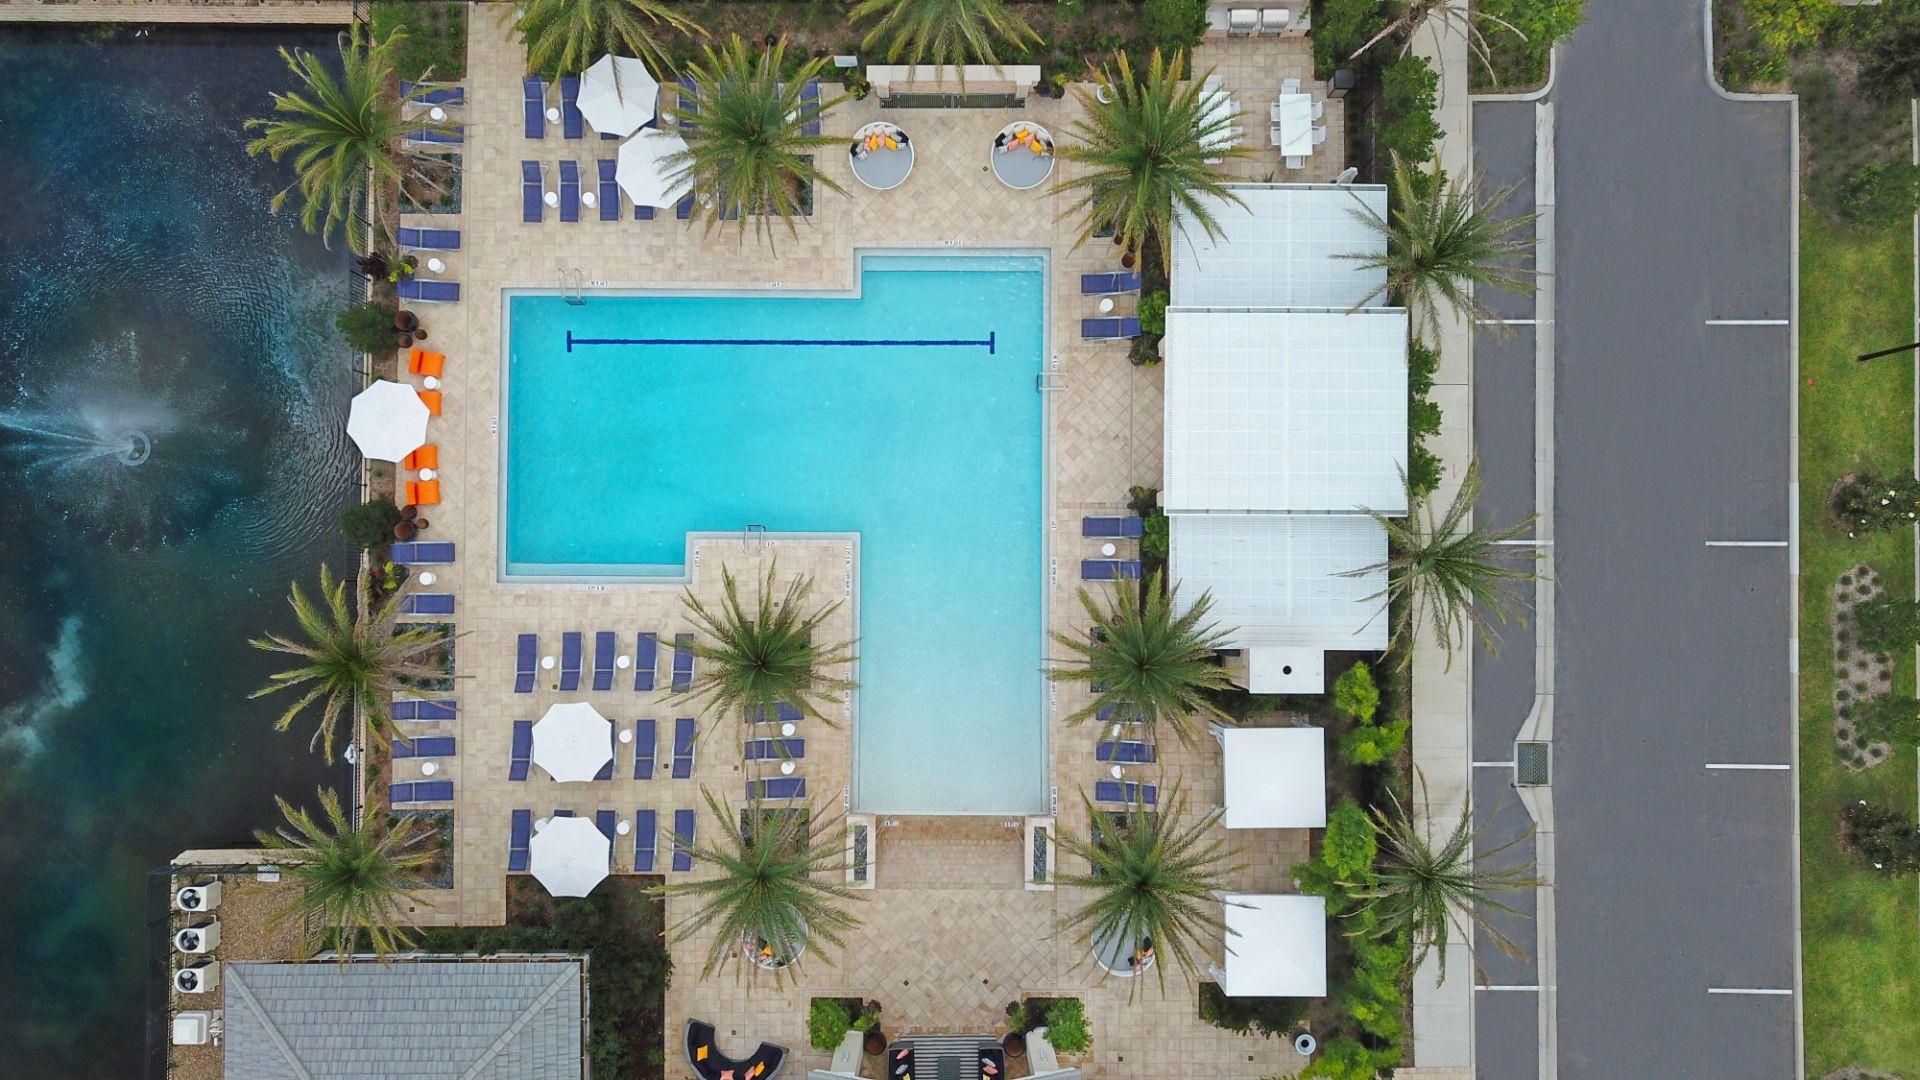 Apartments Near St. Leo Horizon Wiregrass Ranch for Saint Leo University Students in Saint Leo, FL